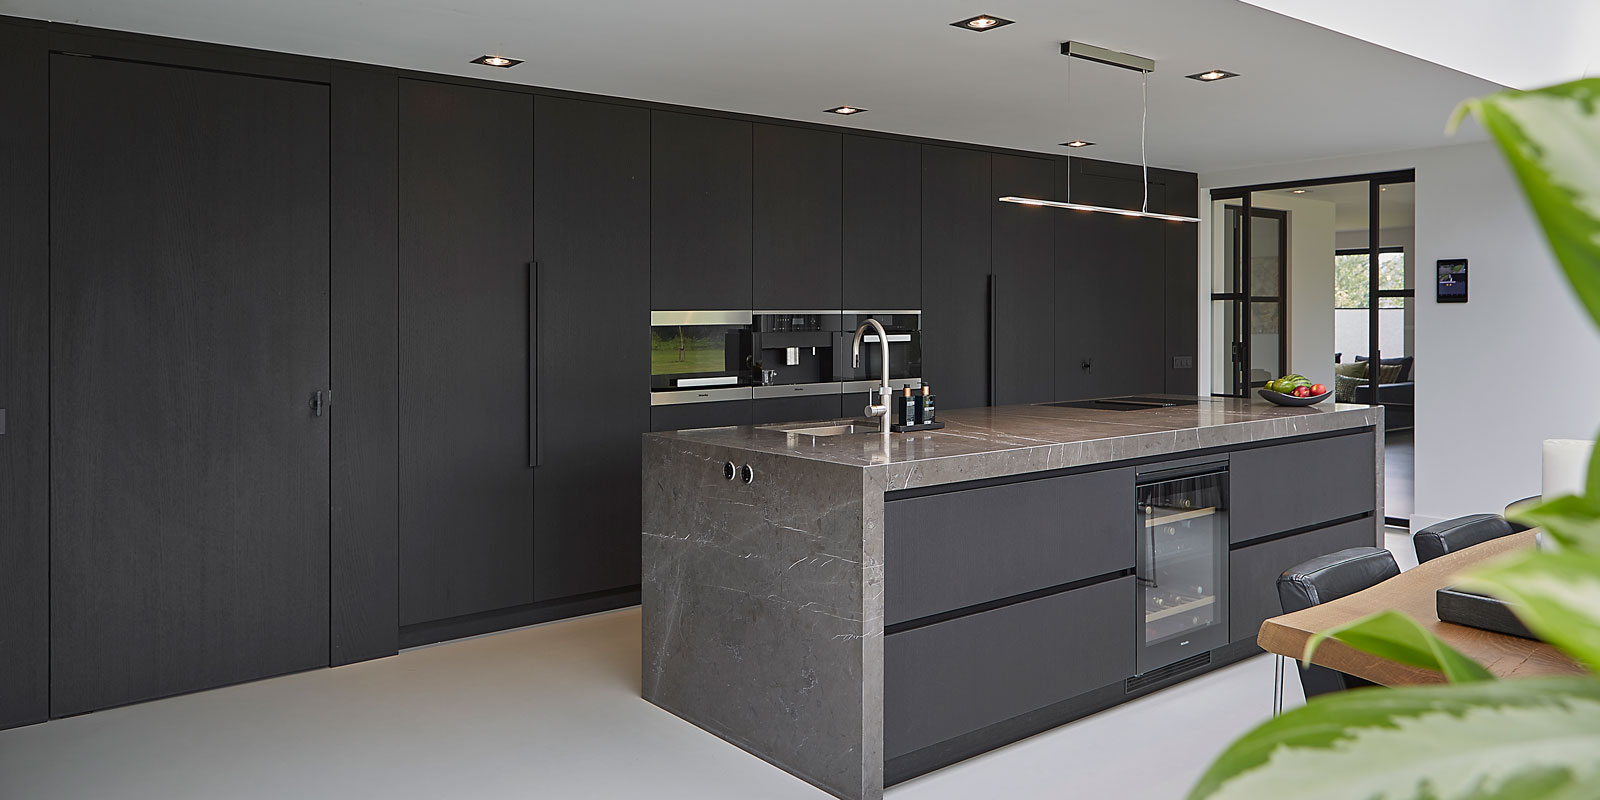 Chic interieur, Mirthe Janus, Open Keuken, Kookeiland, Grijze keuken, strakke keuken, design keuken